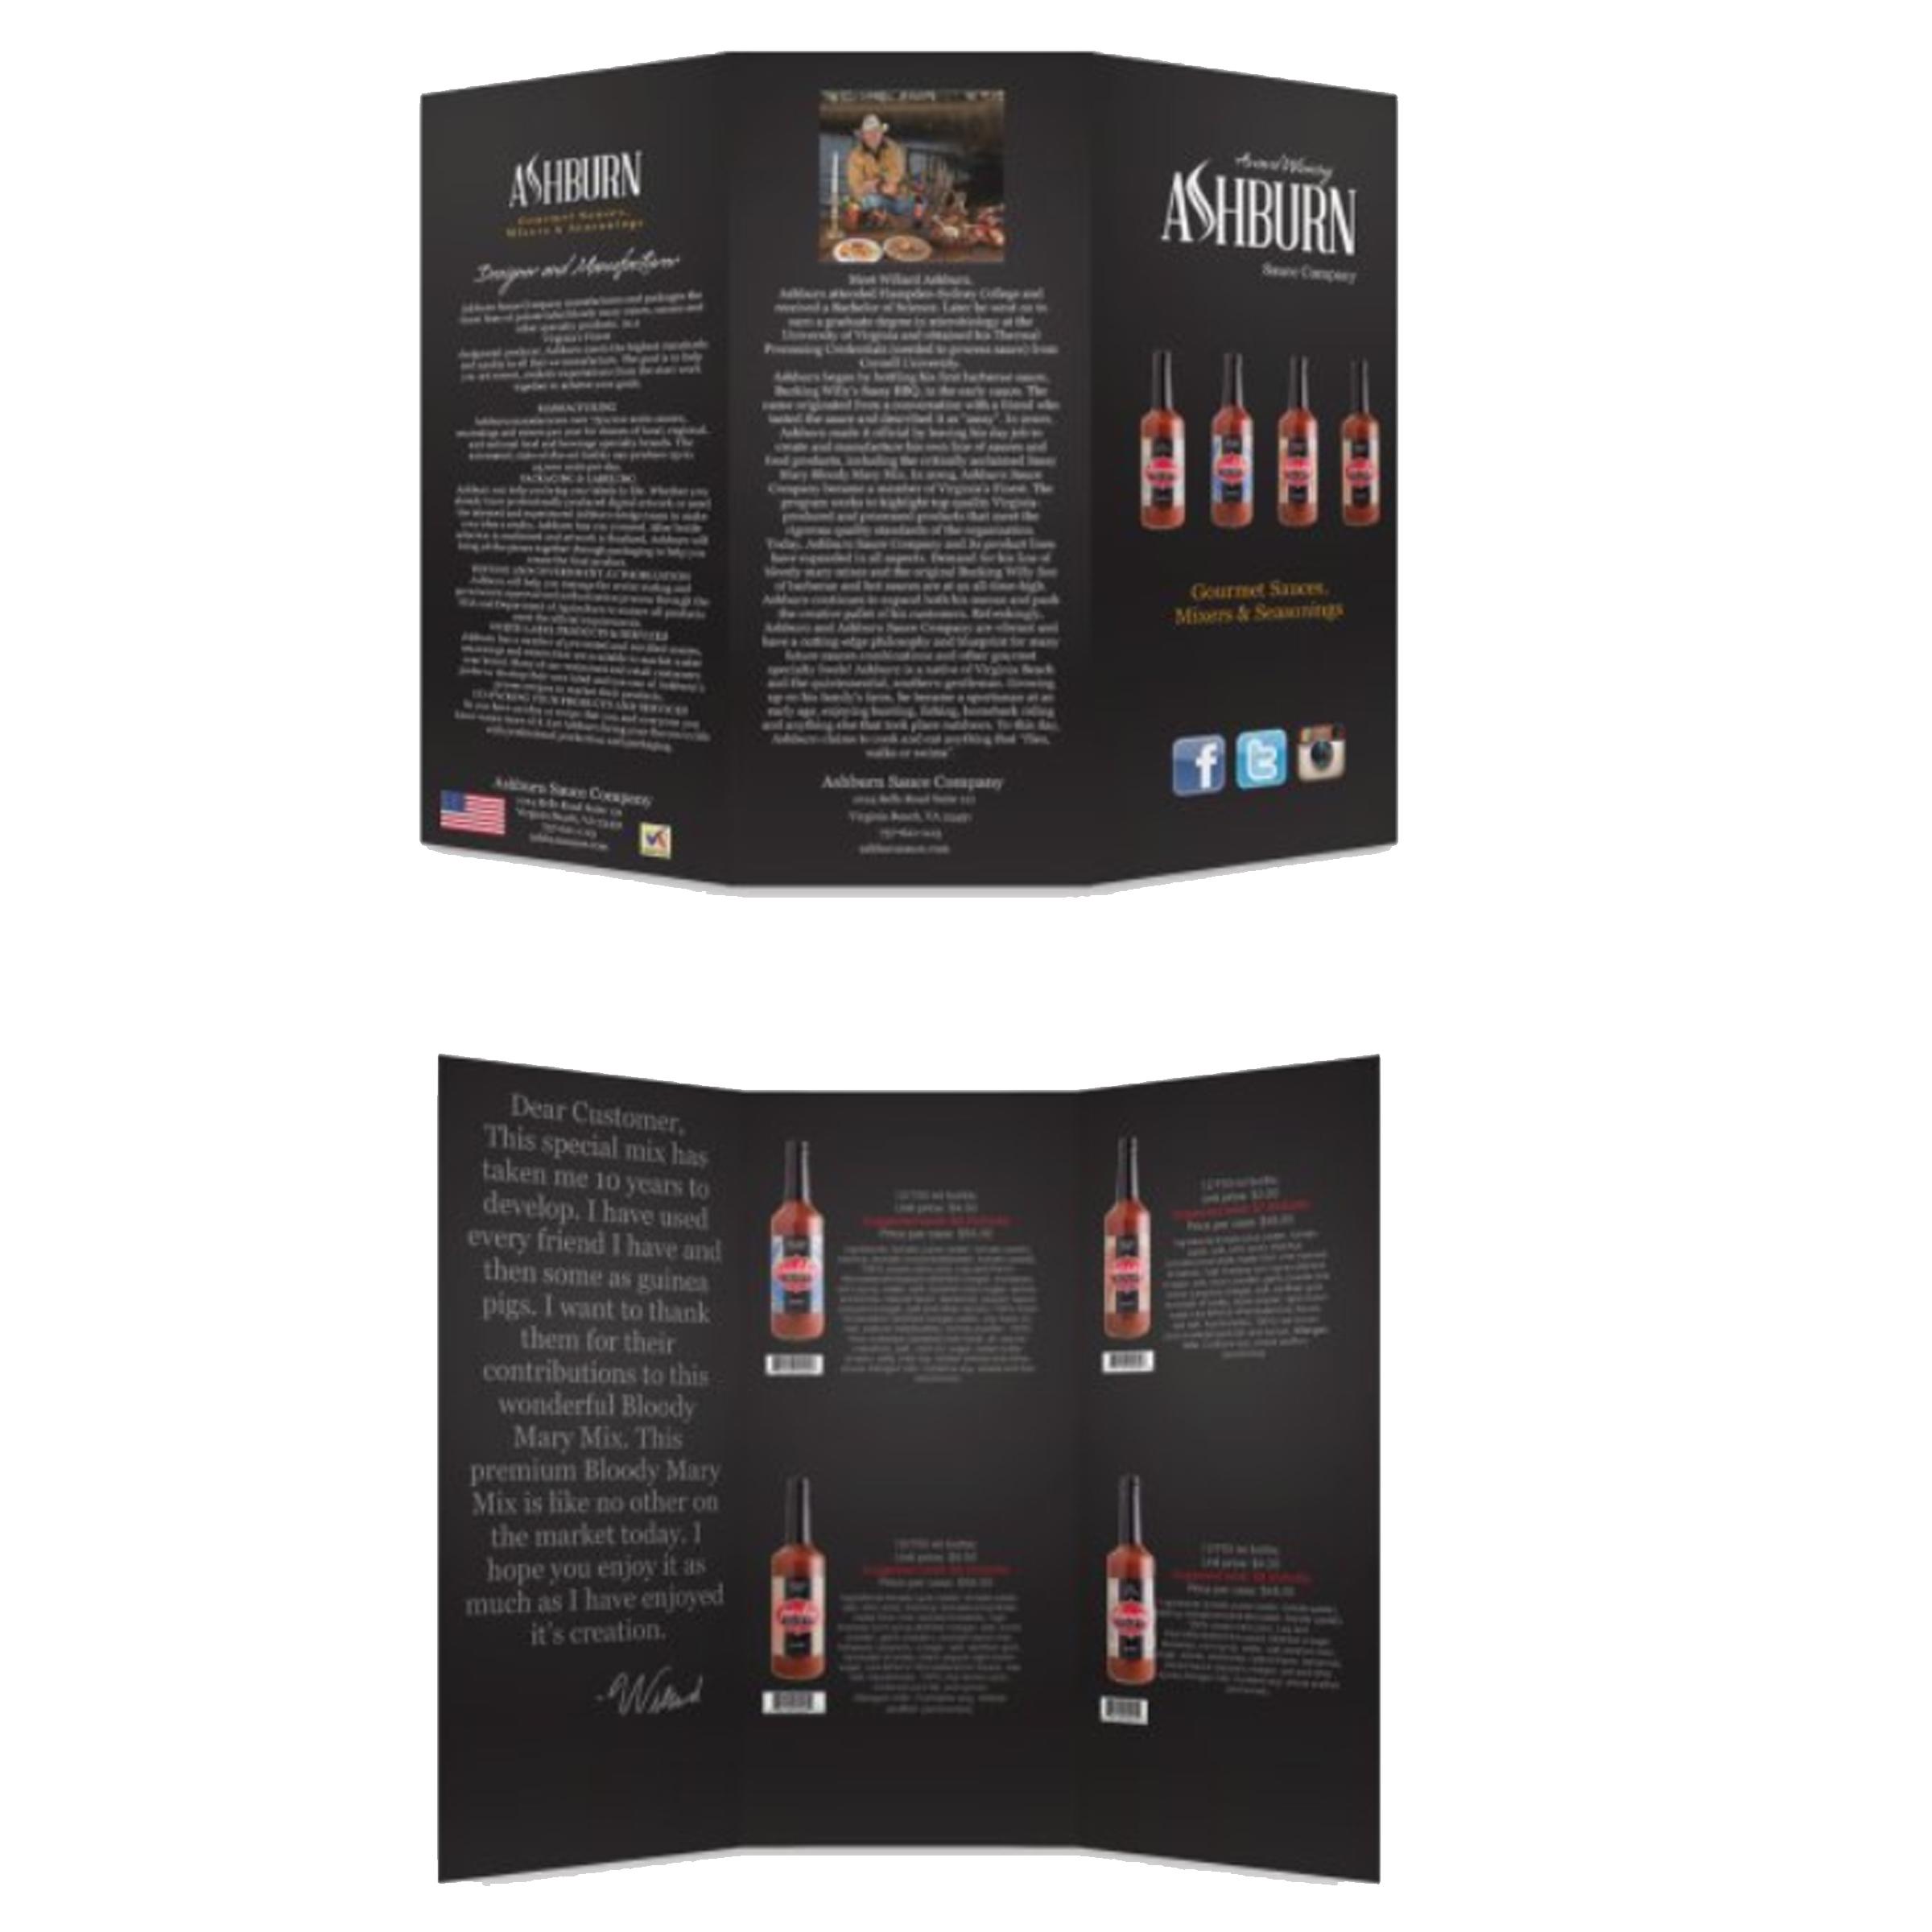 Ashburn brochure